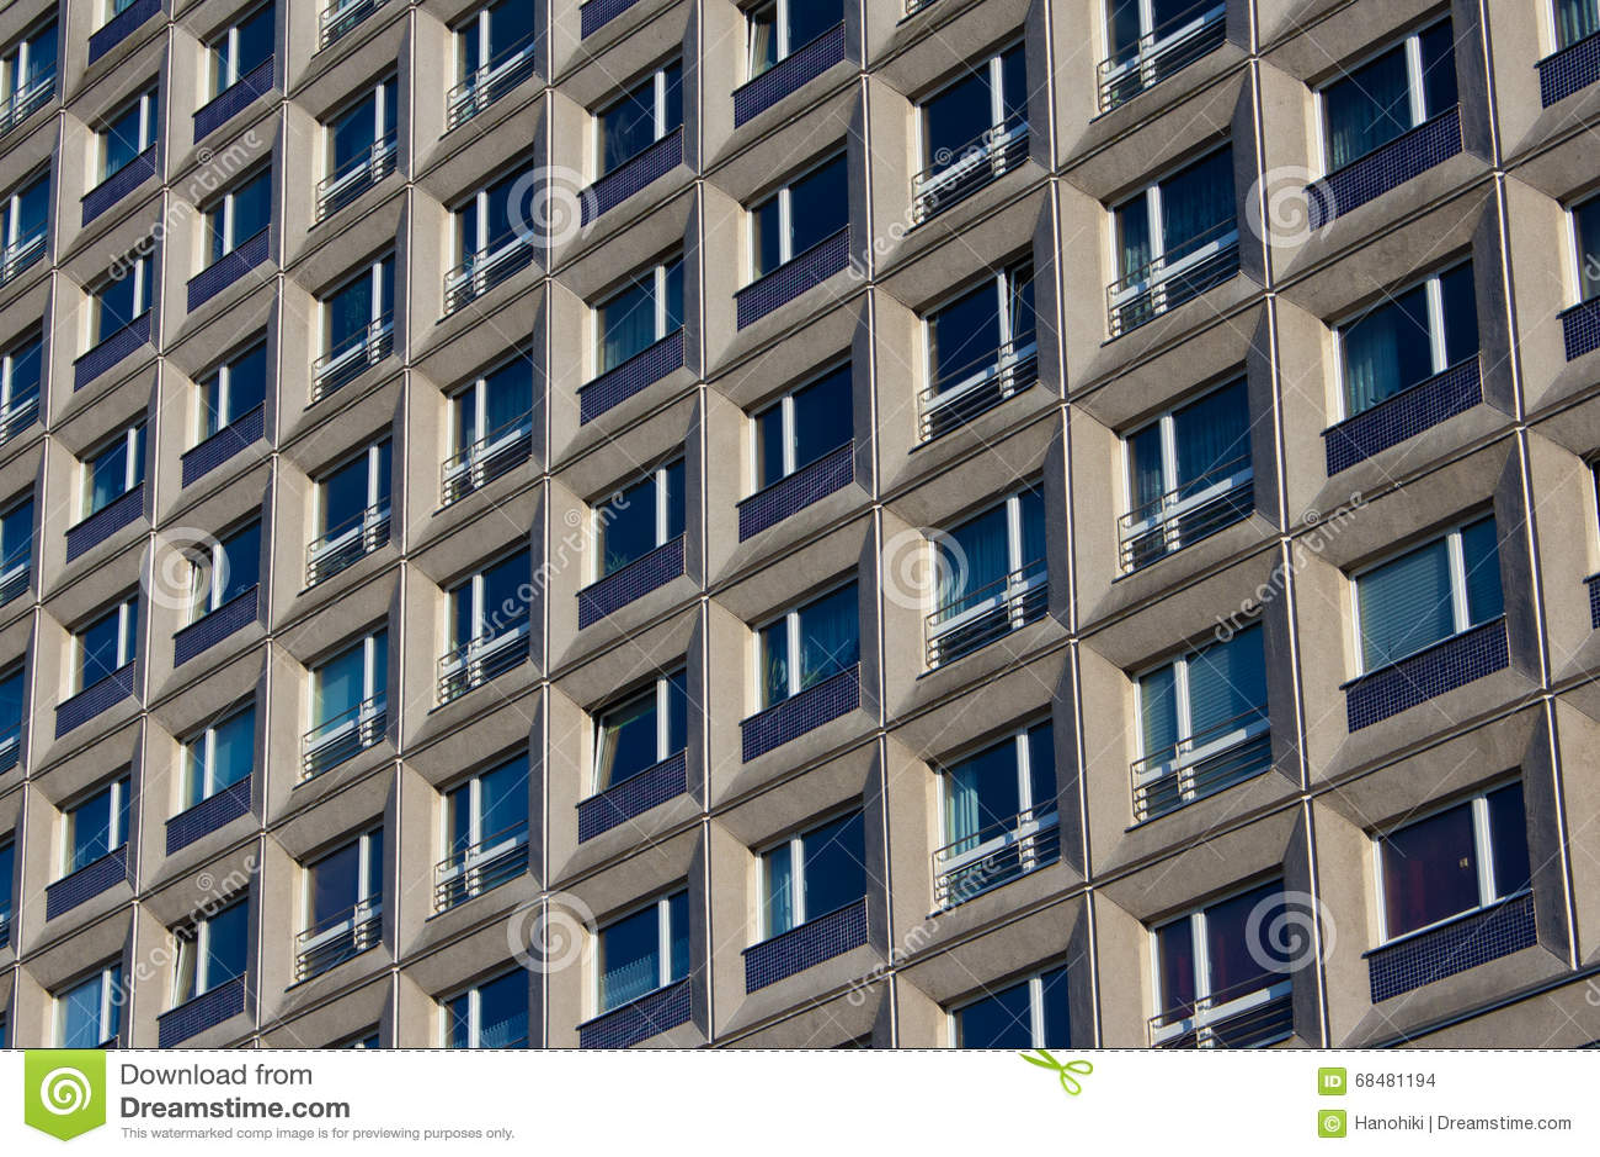 Exterior residential windows - Building Exterior Residential Building Facade Window Pattern Stock Photo